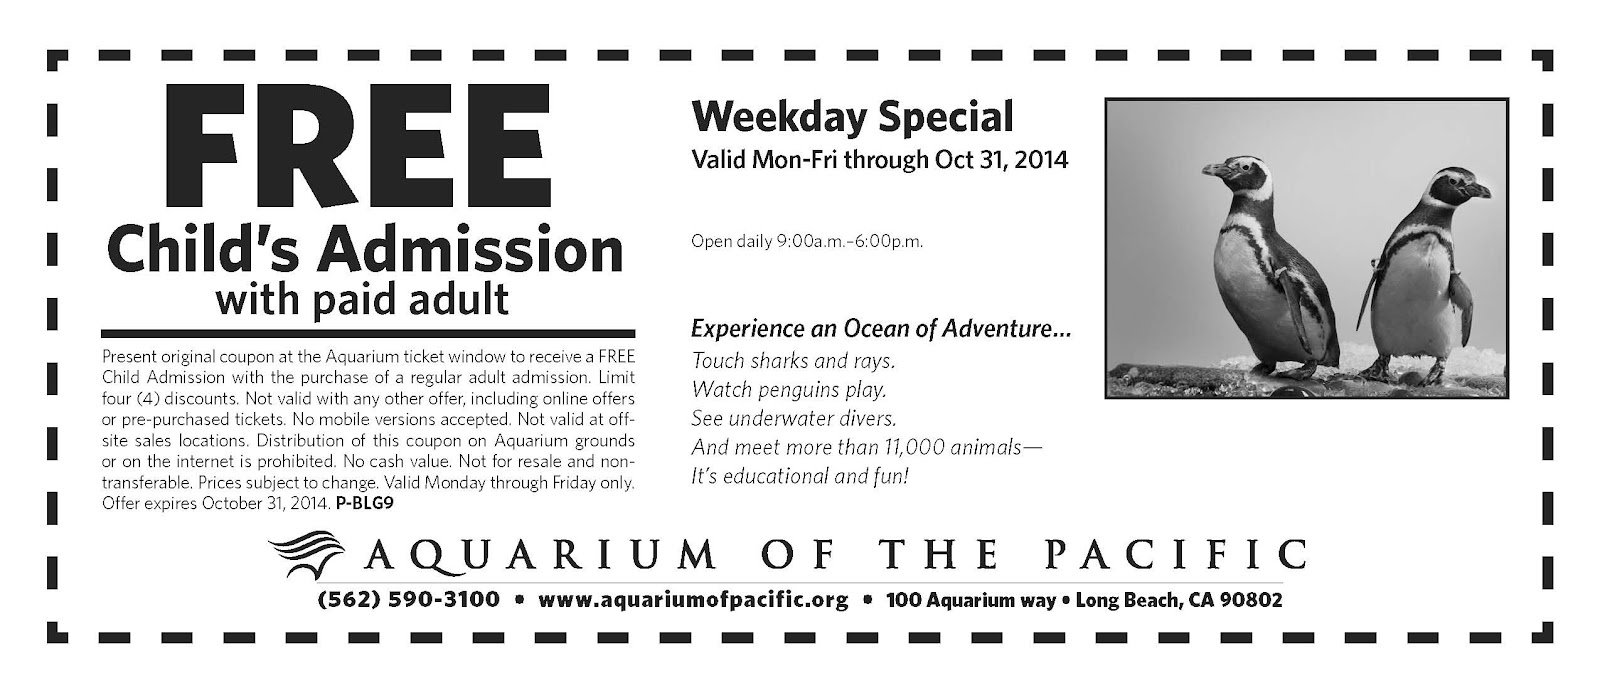 photo relating to Newport Aquarium Coupons Printable identify Price reduction coupon aquarium of the pacific / Wherever toward acquire